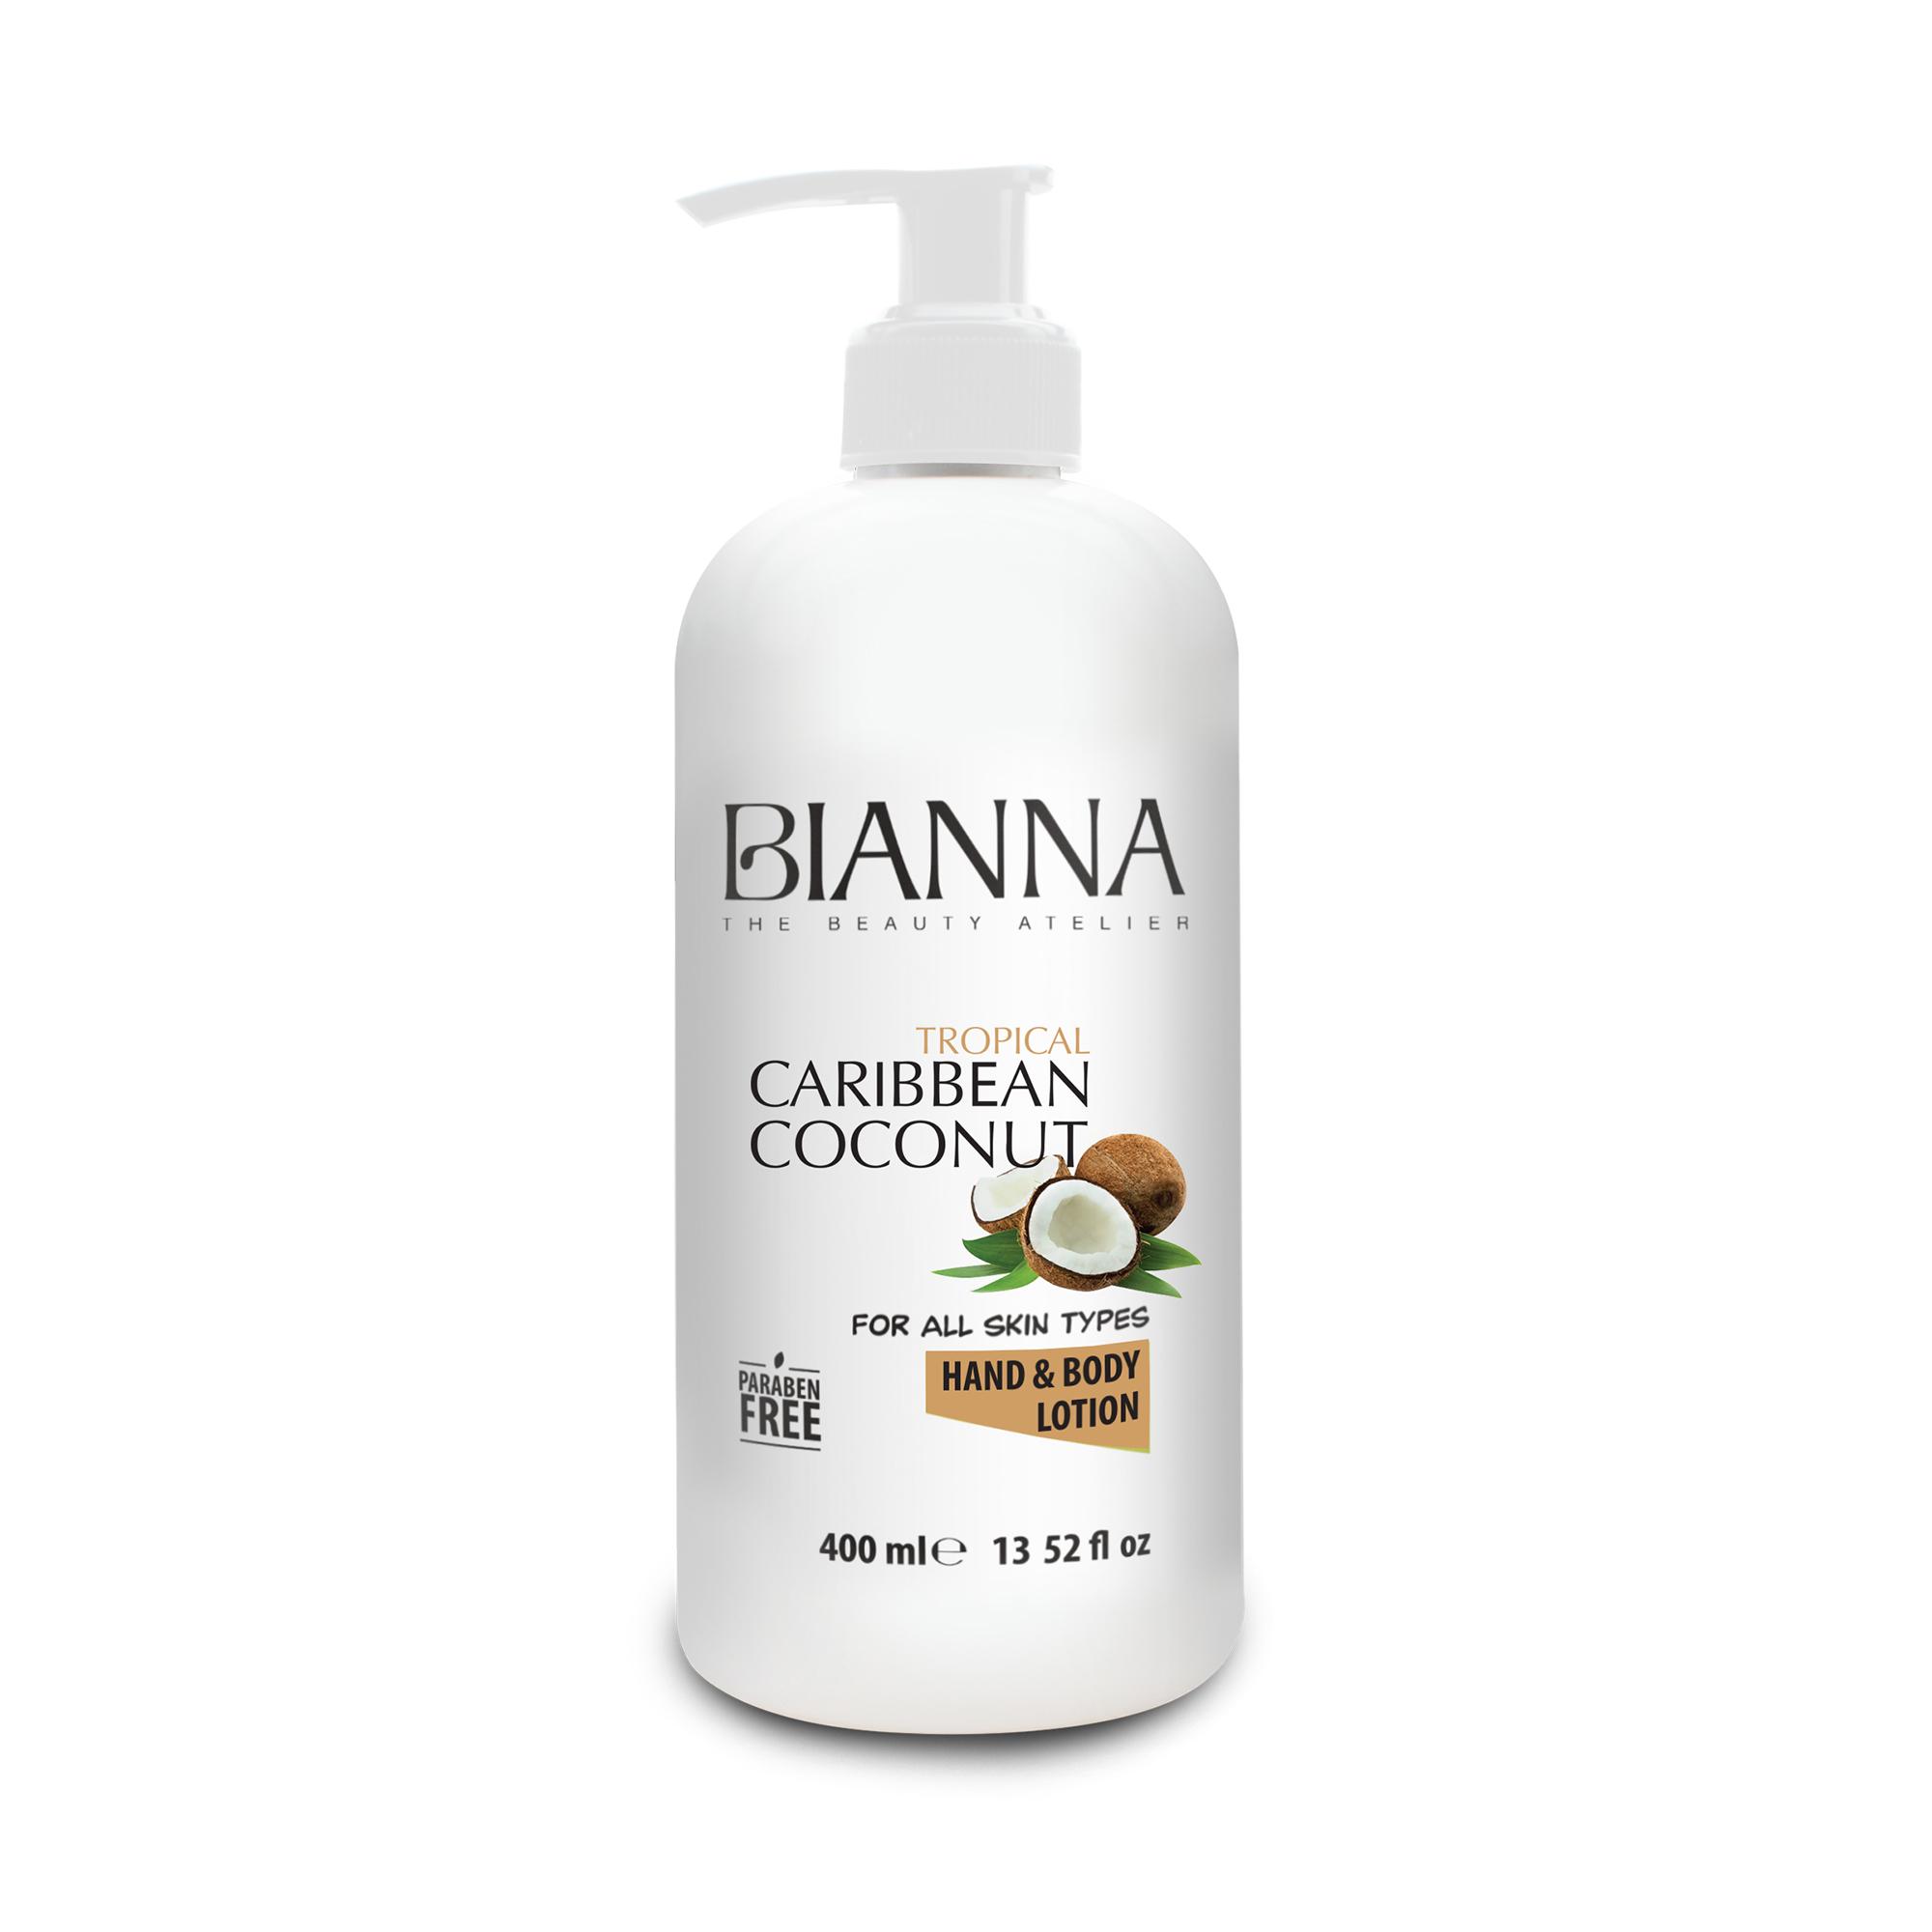 BIANNA HAND & BODY LOTION - CARIBBEAN COCONUT  / 2209-03